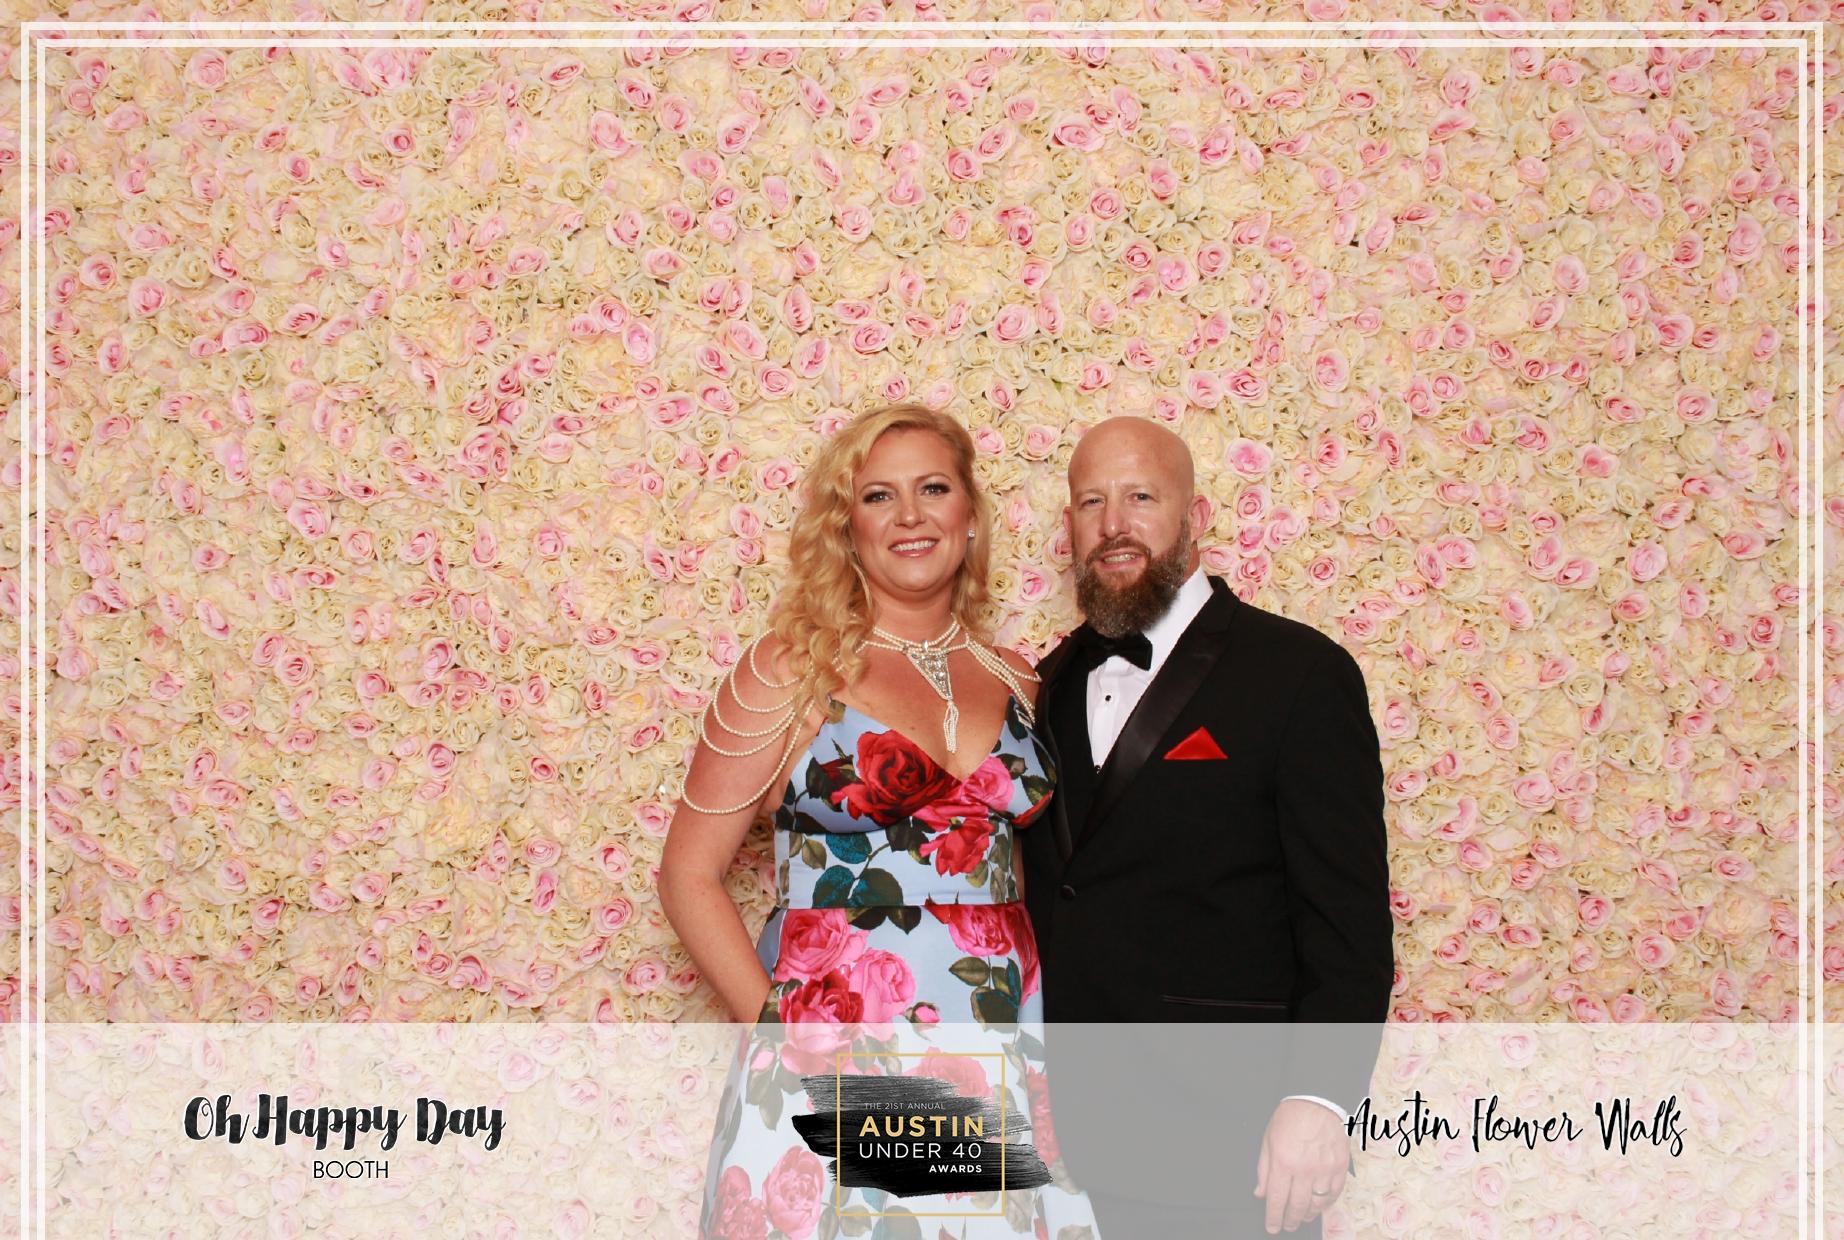 Oh Happy Day Booth - Austin Under 40-41.jpg